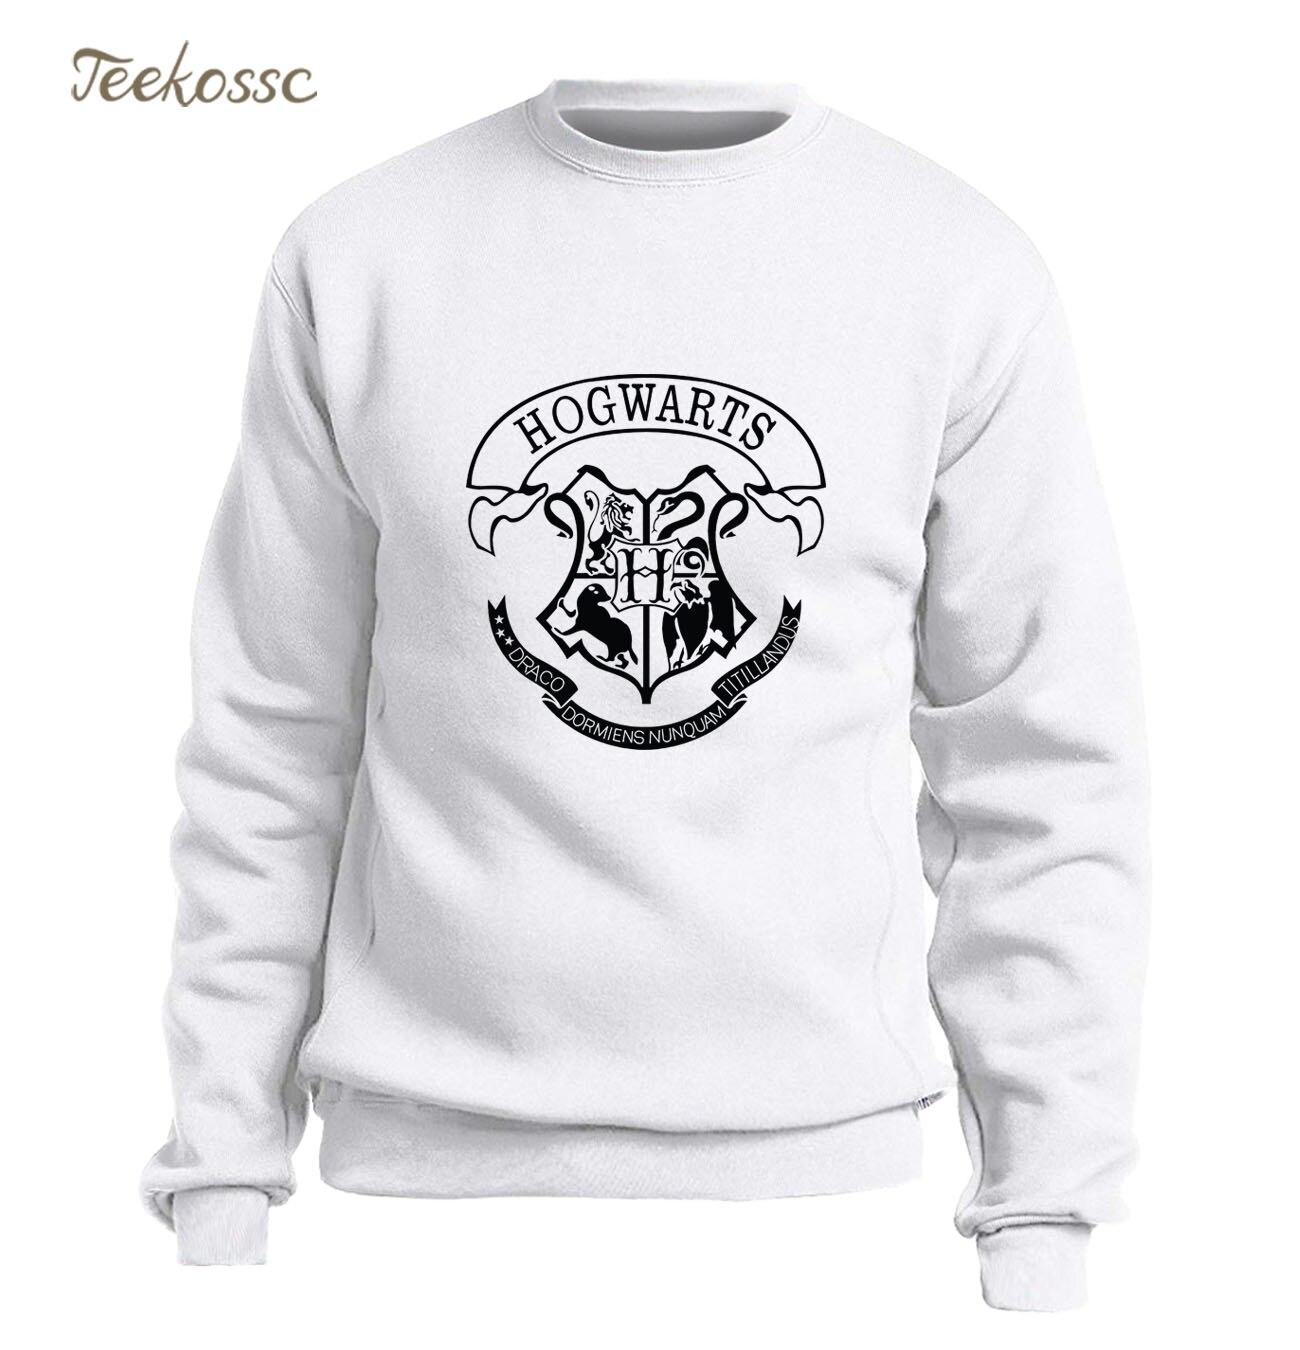 4c71453832c6 Hogwarts Sweatshirt Men Magic Hoodie Graphics Design Crewneck Sweatshirts  2018 Winter Autumn Fleece Warm Slim Fit Brand Clothing-in Hoodies    Sweatshirts ...